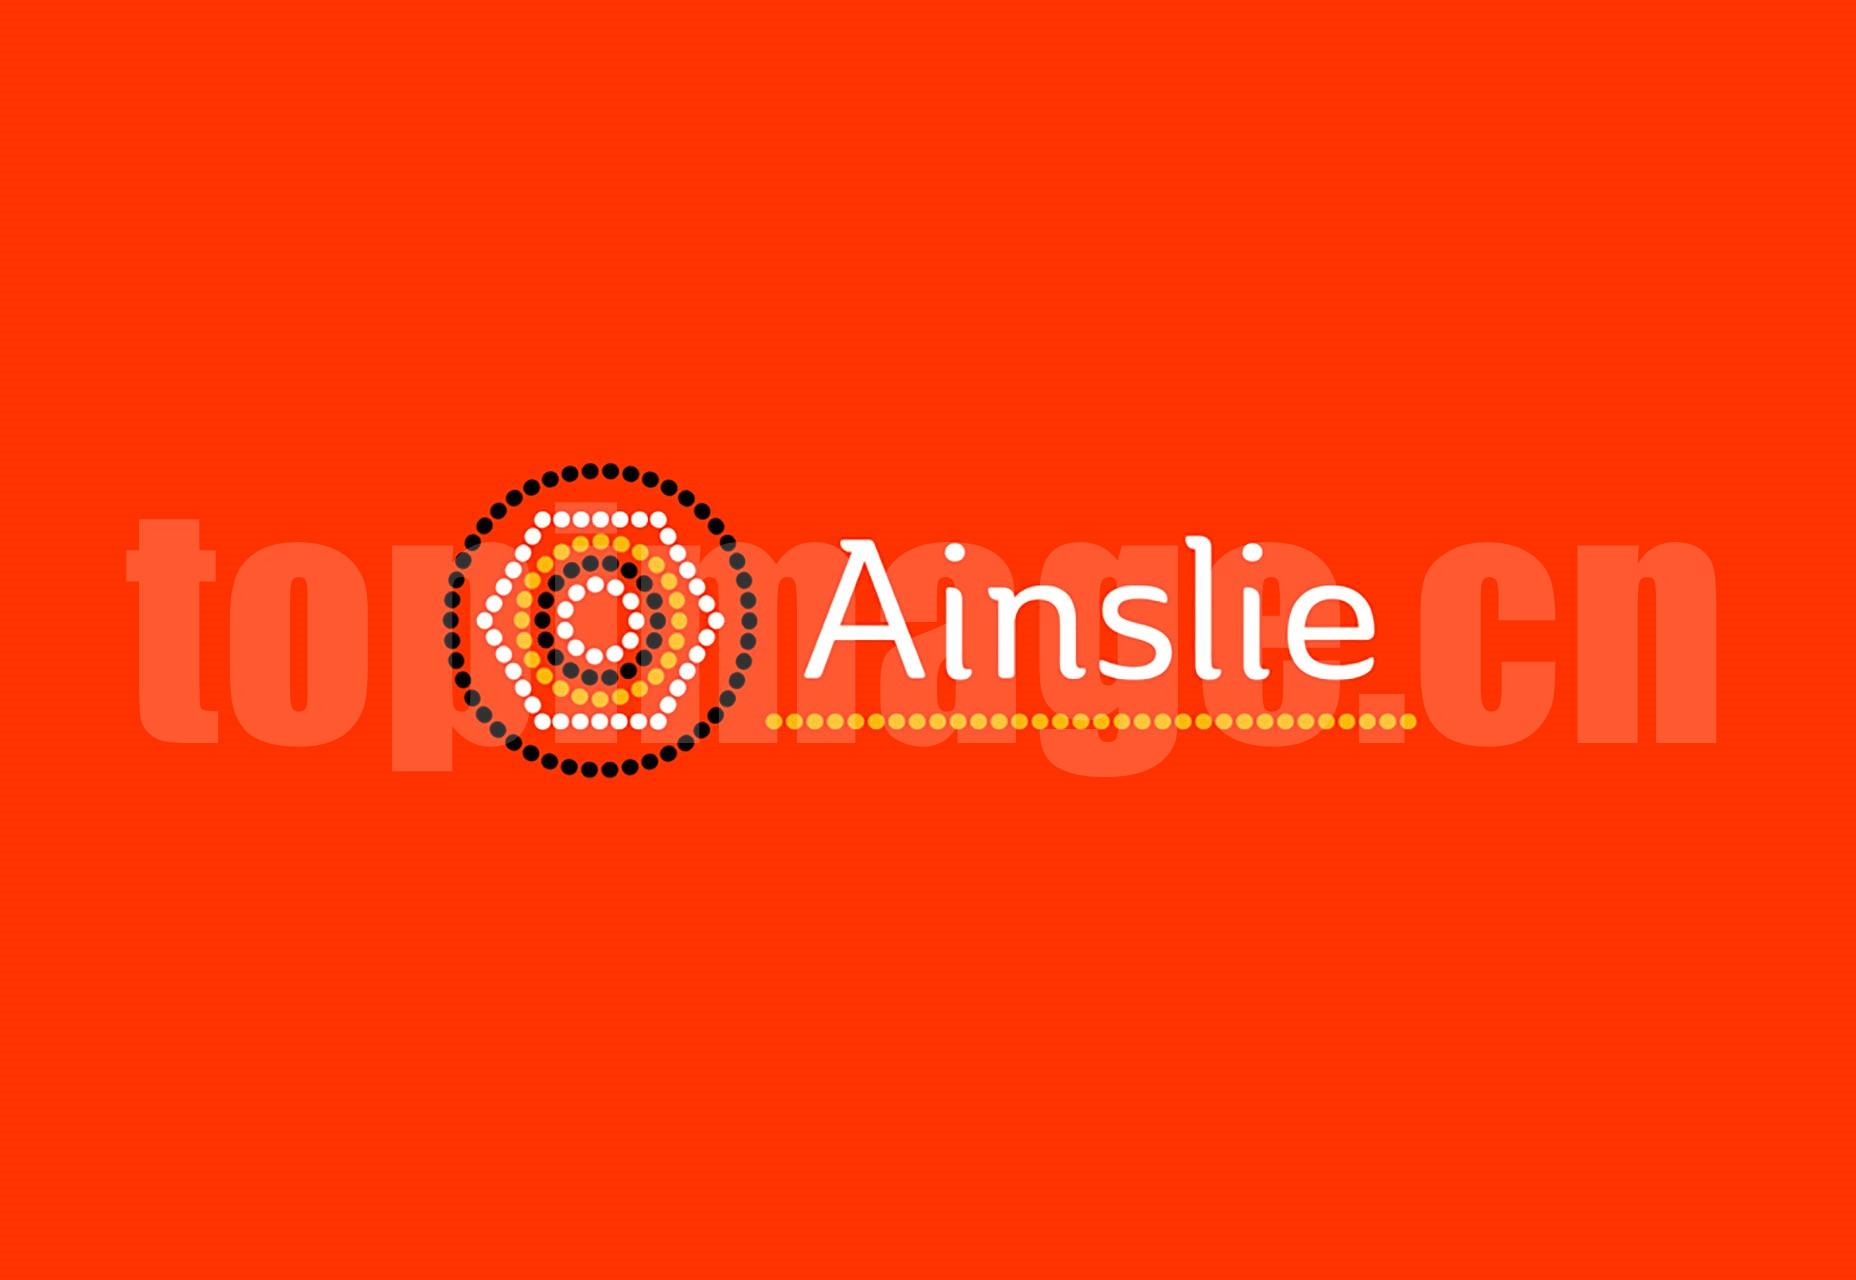 Ainslie Regular 现代简约纤细 英文字体 logo设计字体下载